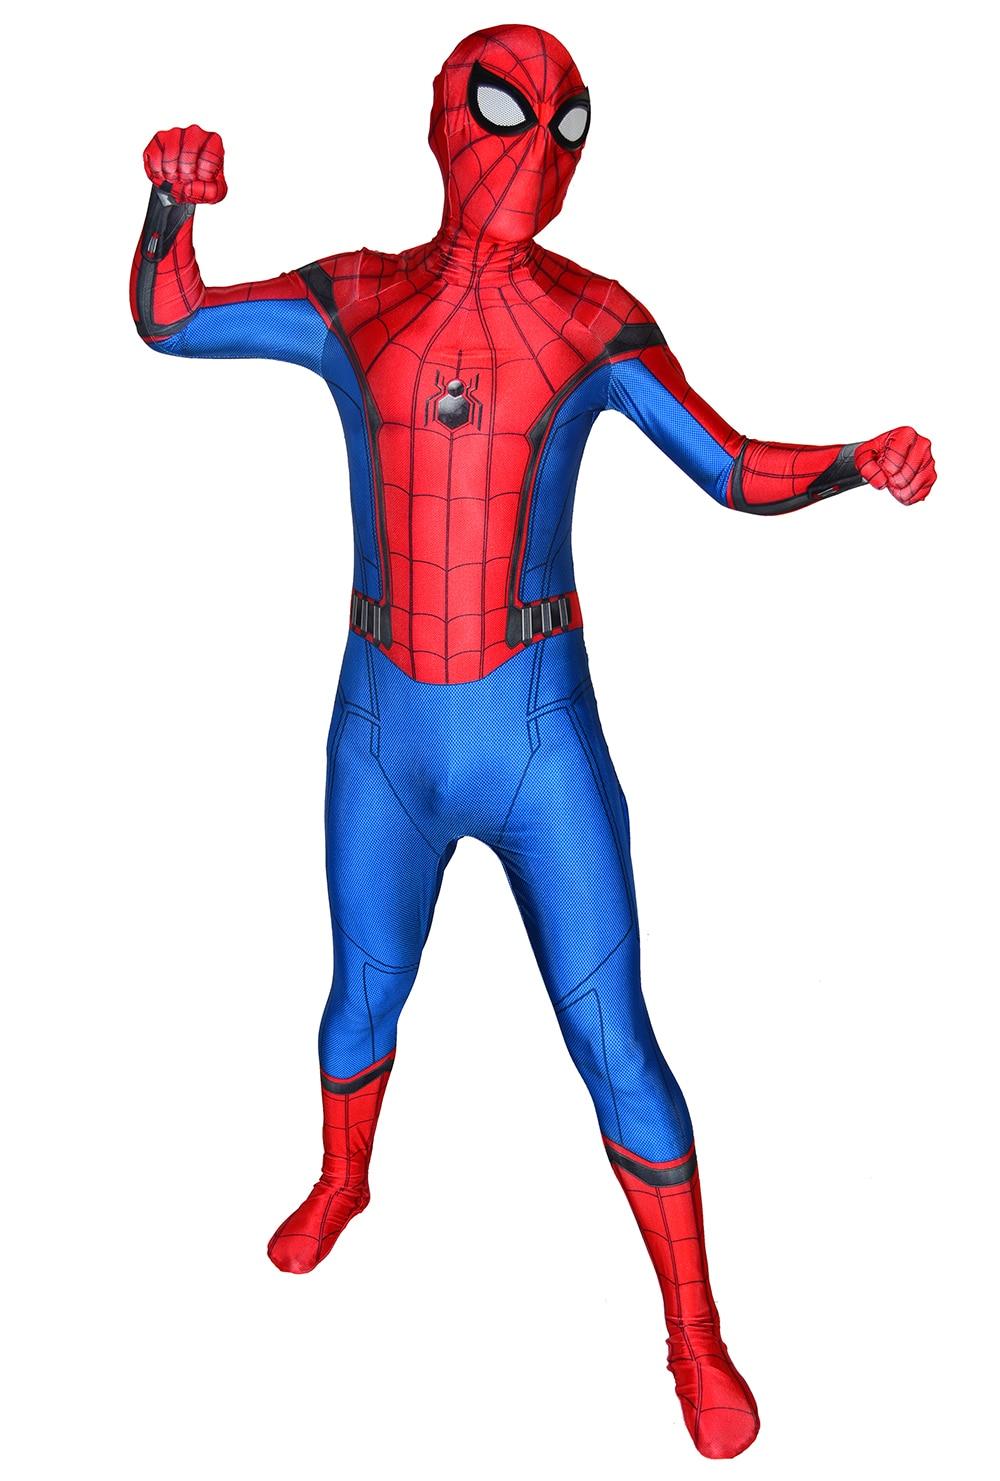 Spider-Man Homecoming Cosplay Costume 3D Printed Spiderman Homecoming Spandex Suit Newest Spiderman Halloween Bodysuit